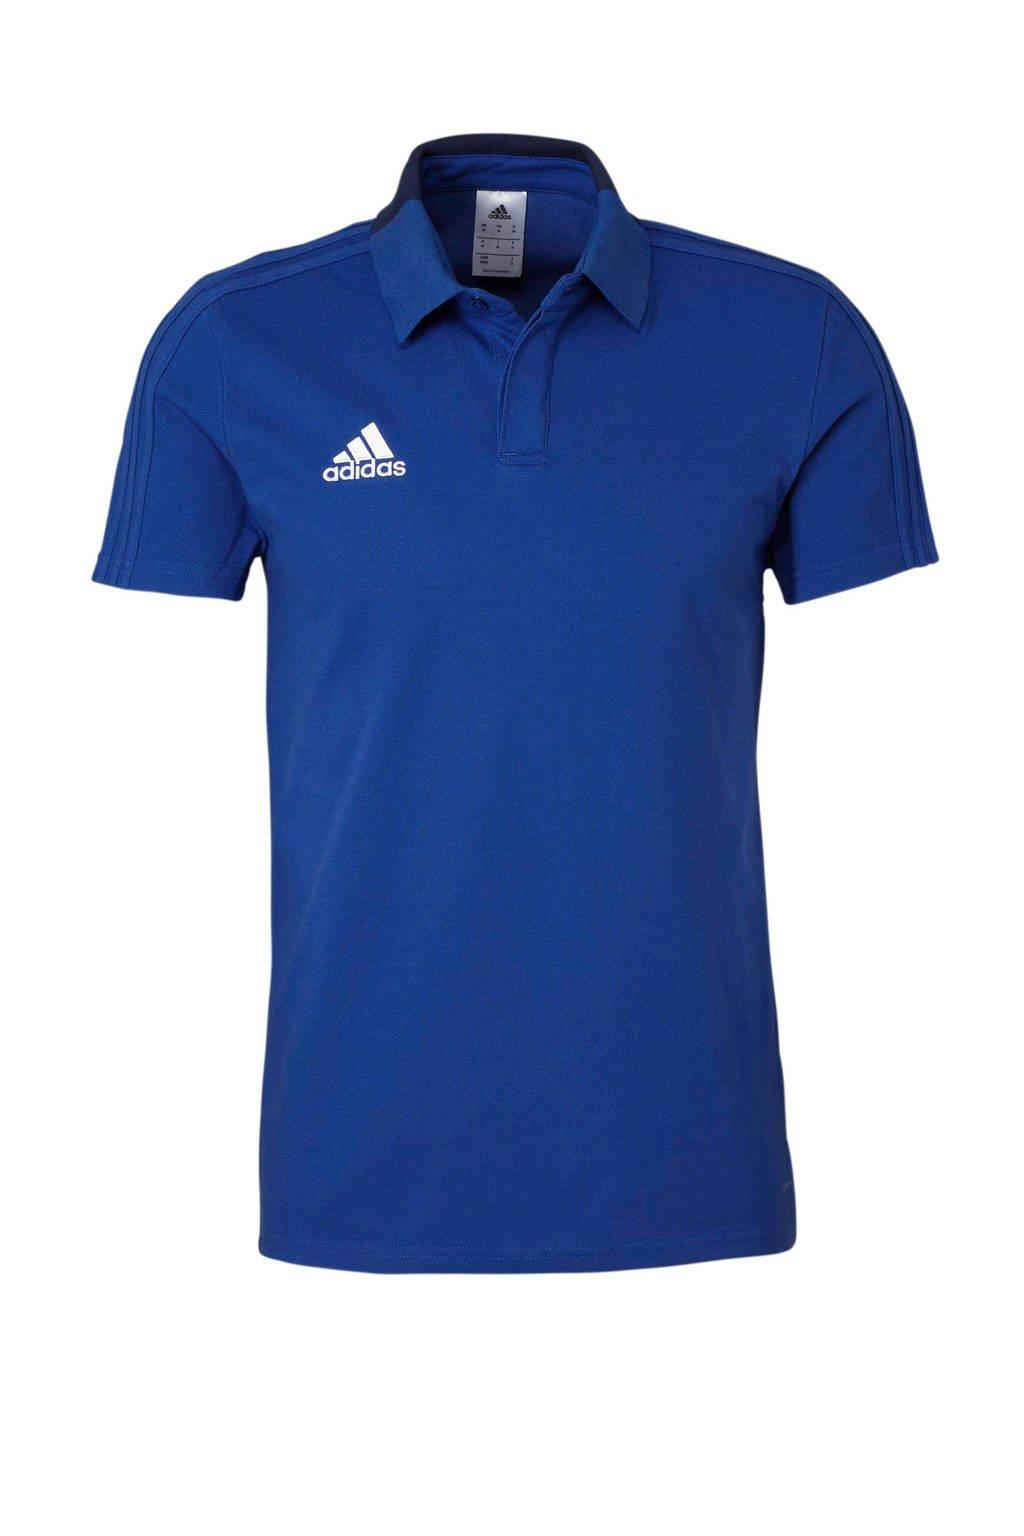 adidas   sportpolo Con18 blauw, Blauw